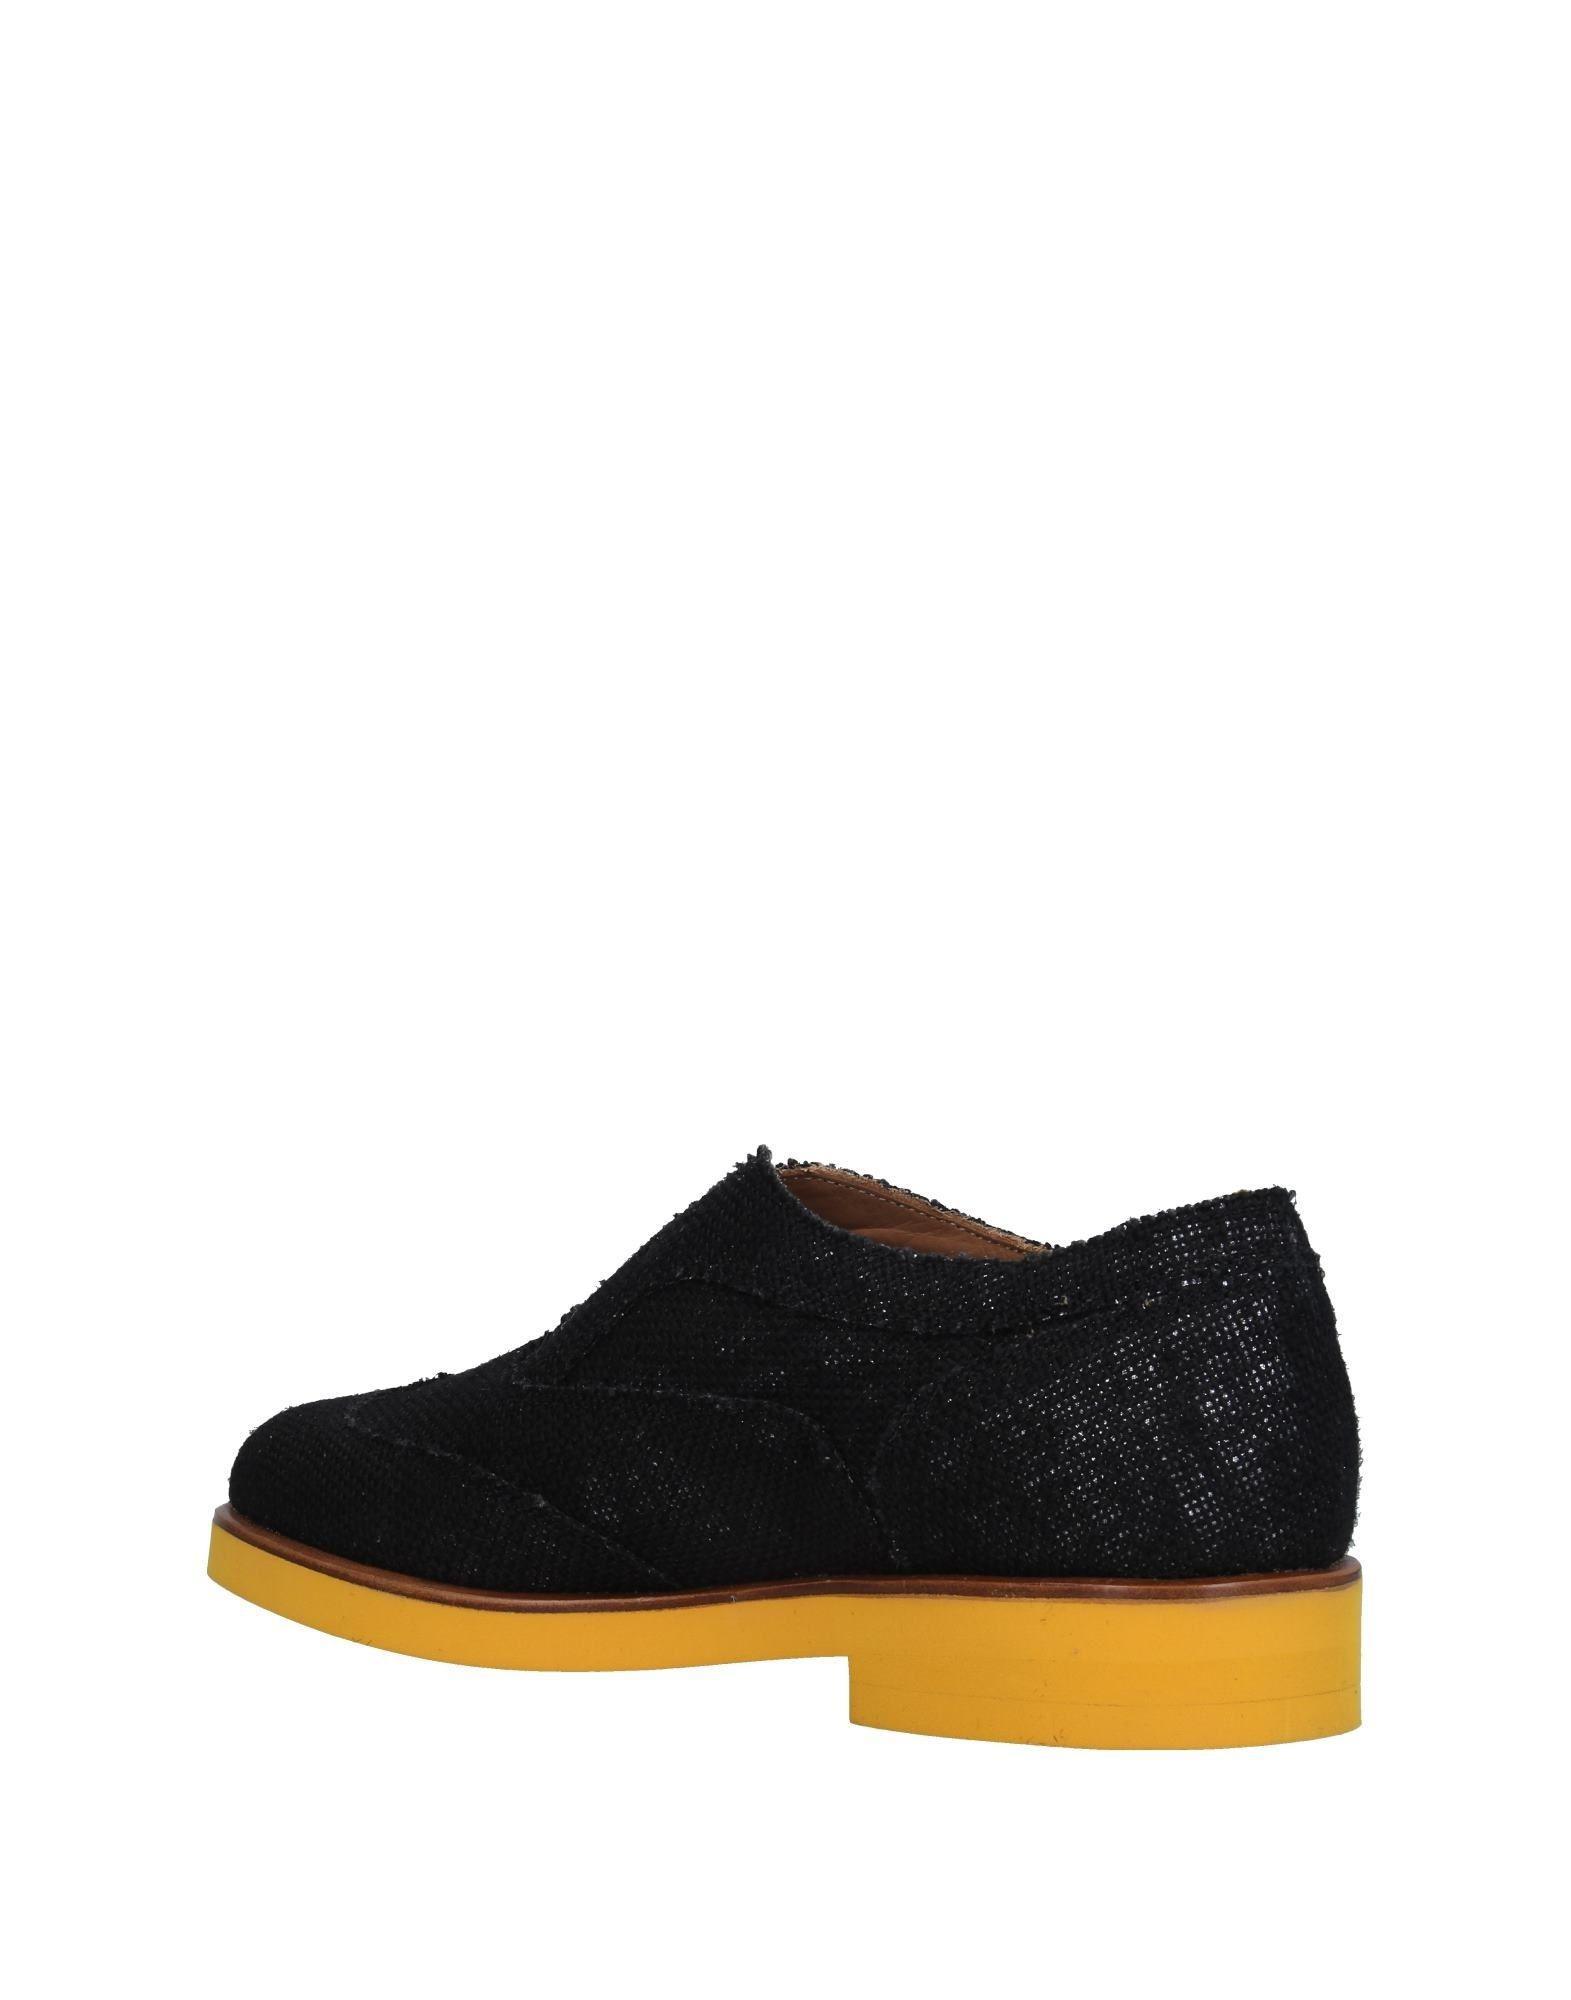 1b75155bb48 Lyst - L F Shoes Loafer in Black for Men